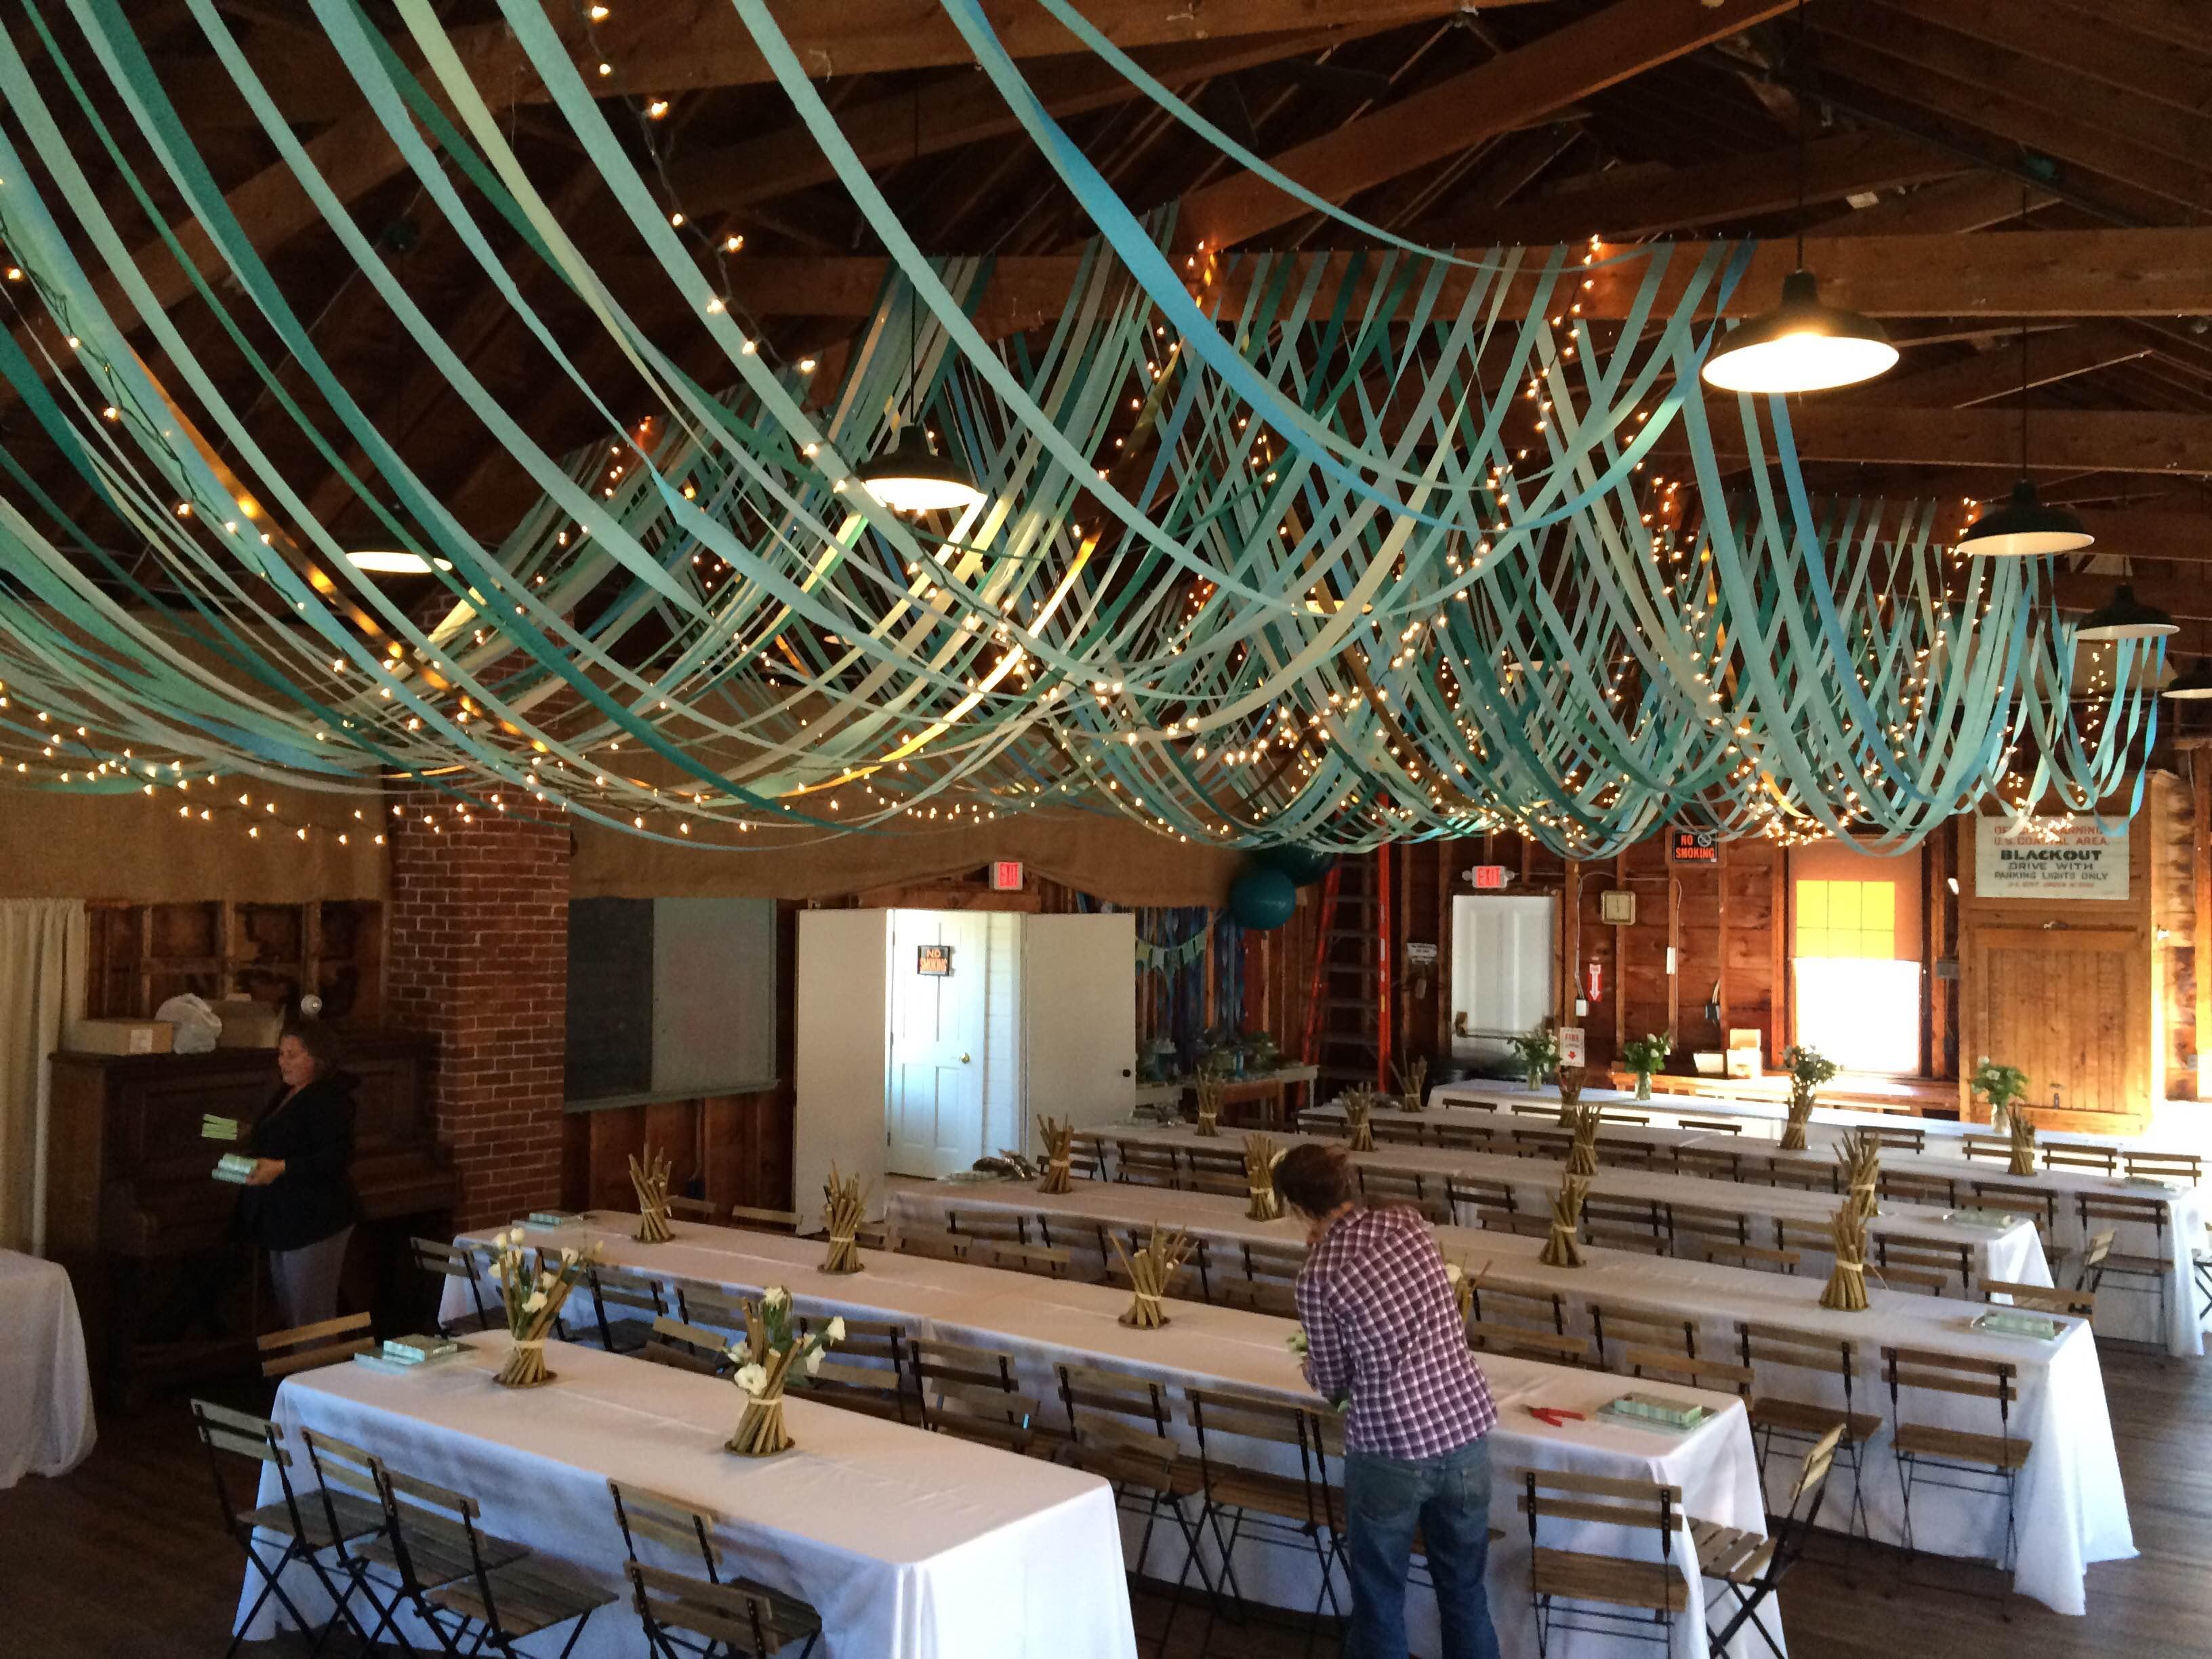 Hall decor oct 2015 2